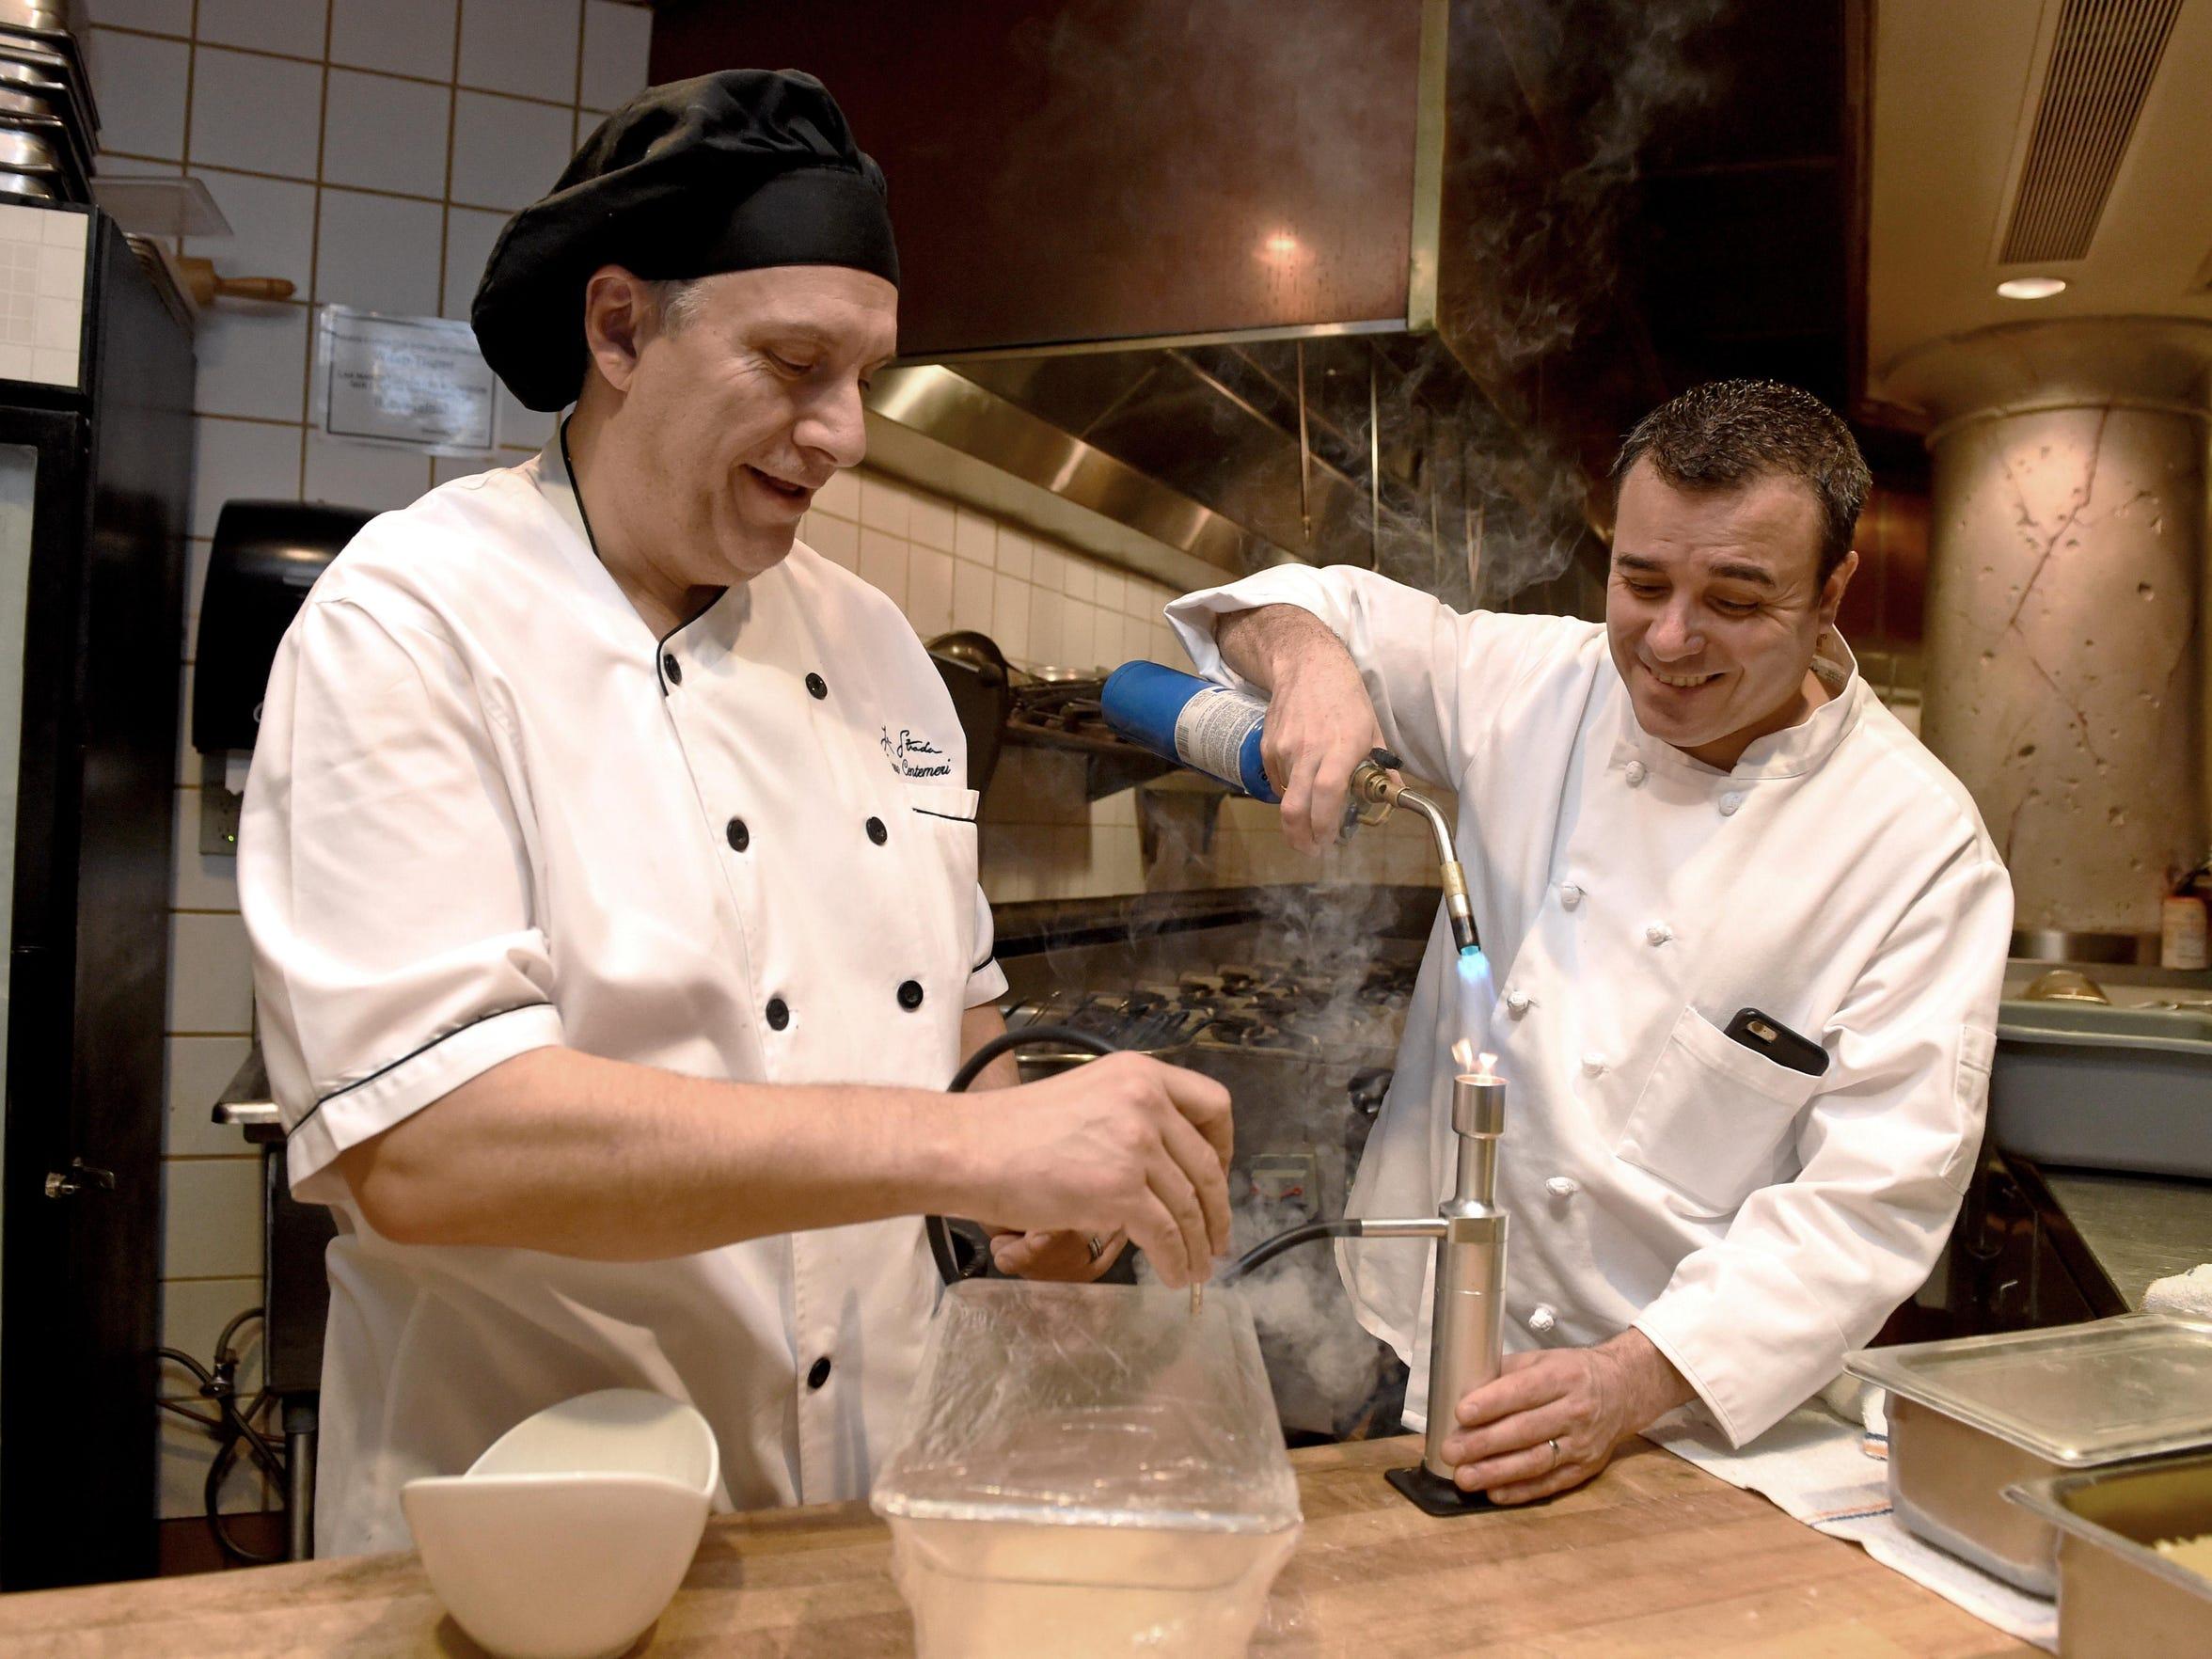 Eldorado executive chef Ivano Centemeri, left, and La Strada chef Massimo Riggio smoke lobster in the restaurant's kitchen. Don Carano, the late Eldorado founder, sometimes recruited chefs from Italy to helm his flagship restaurant.